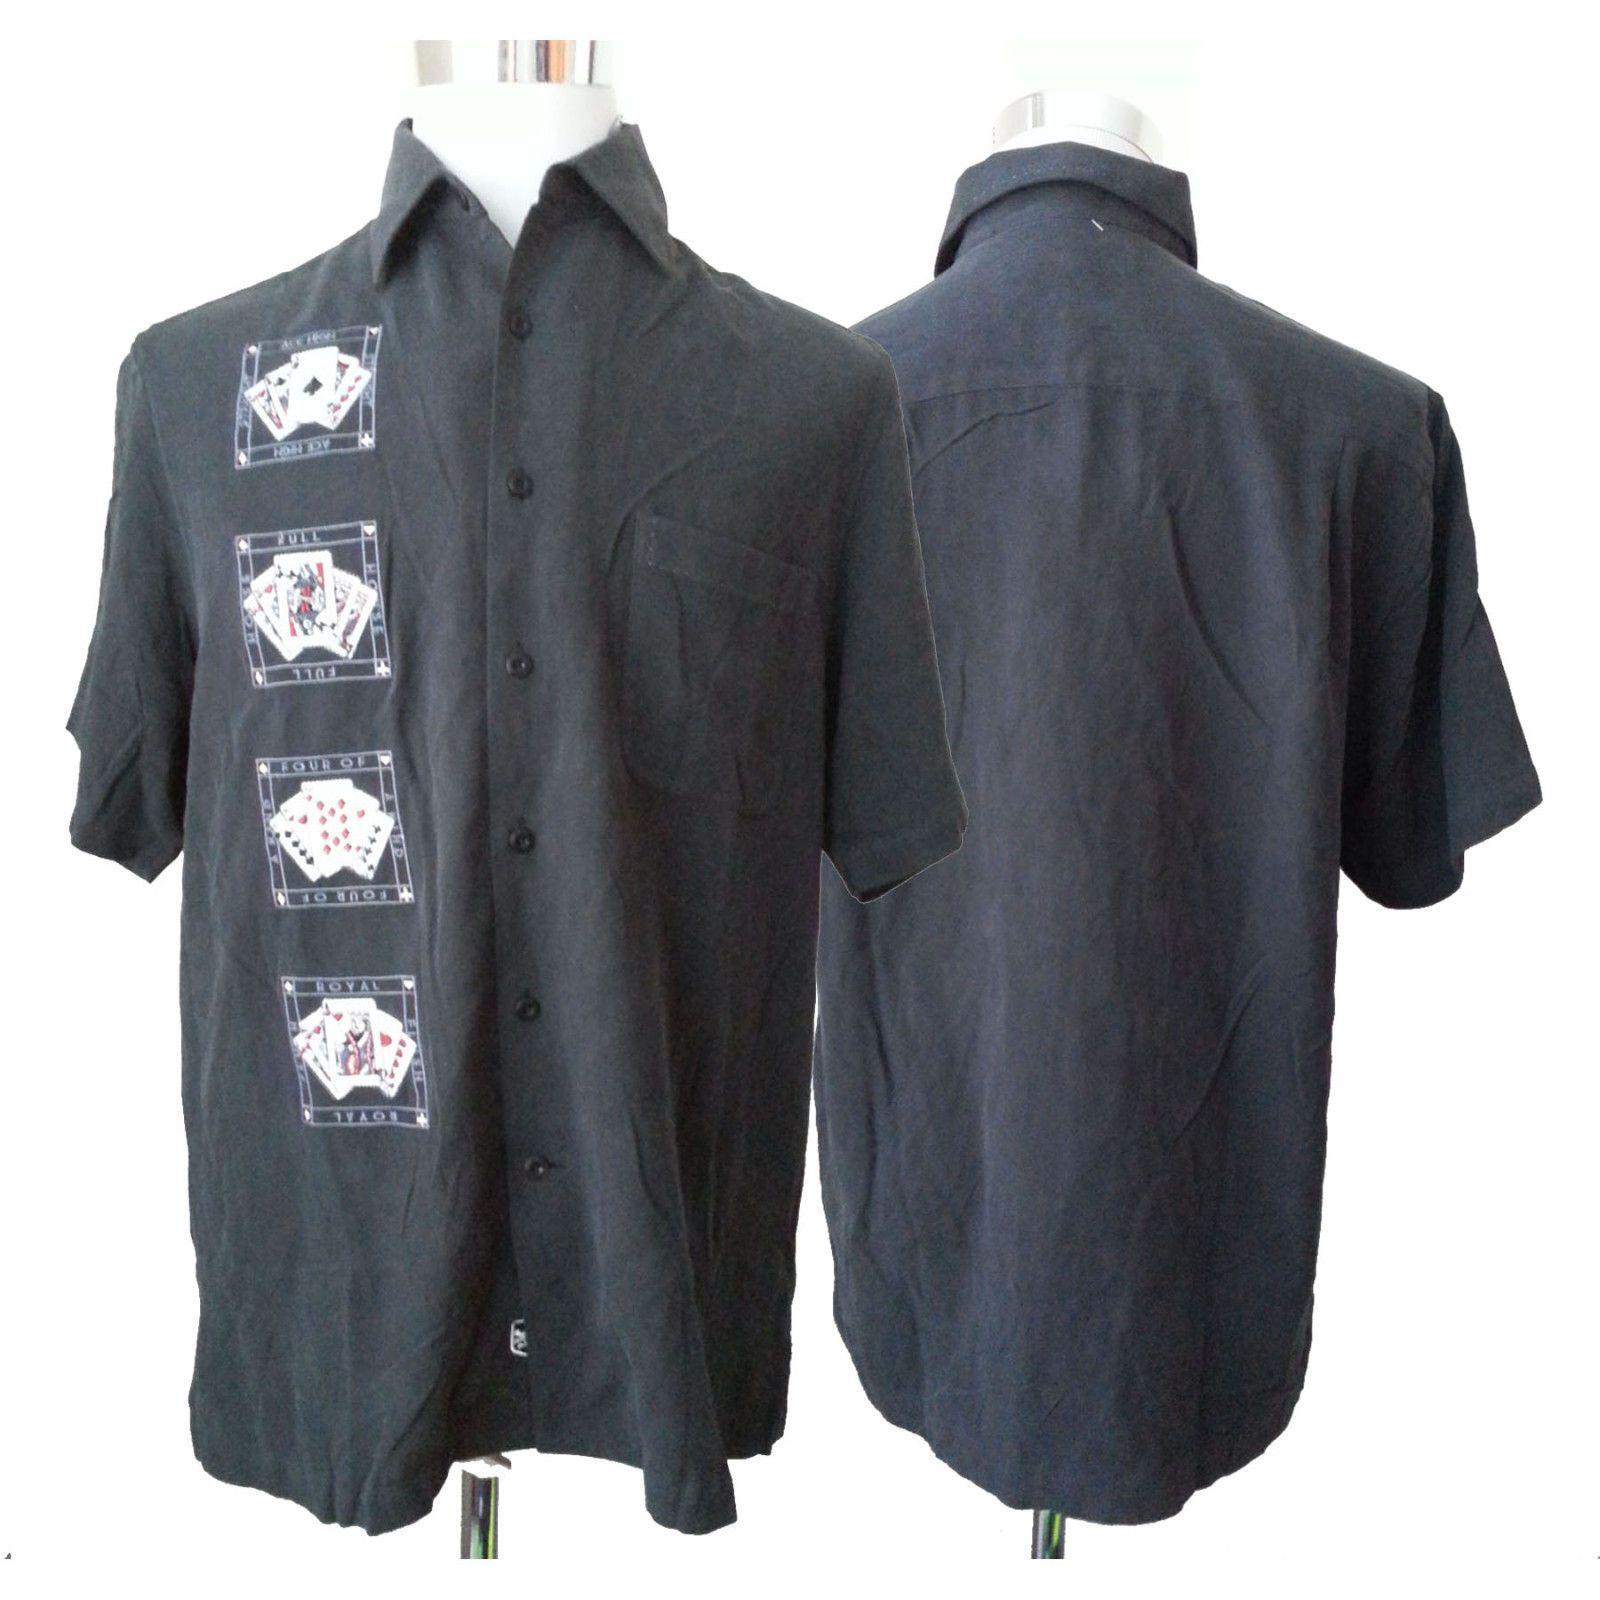 Nat nash luxury originals men silk hawaiian shirt size m black short